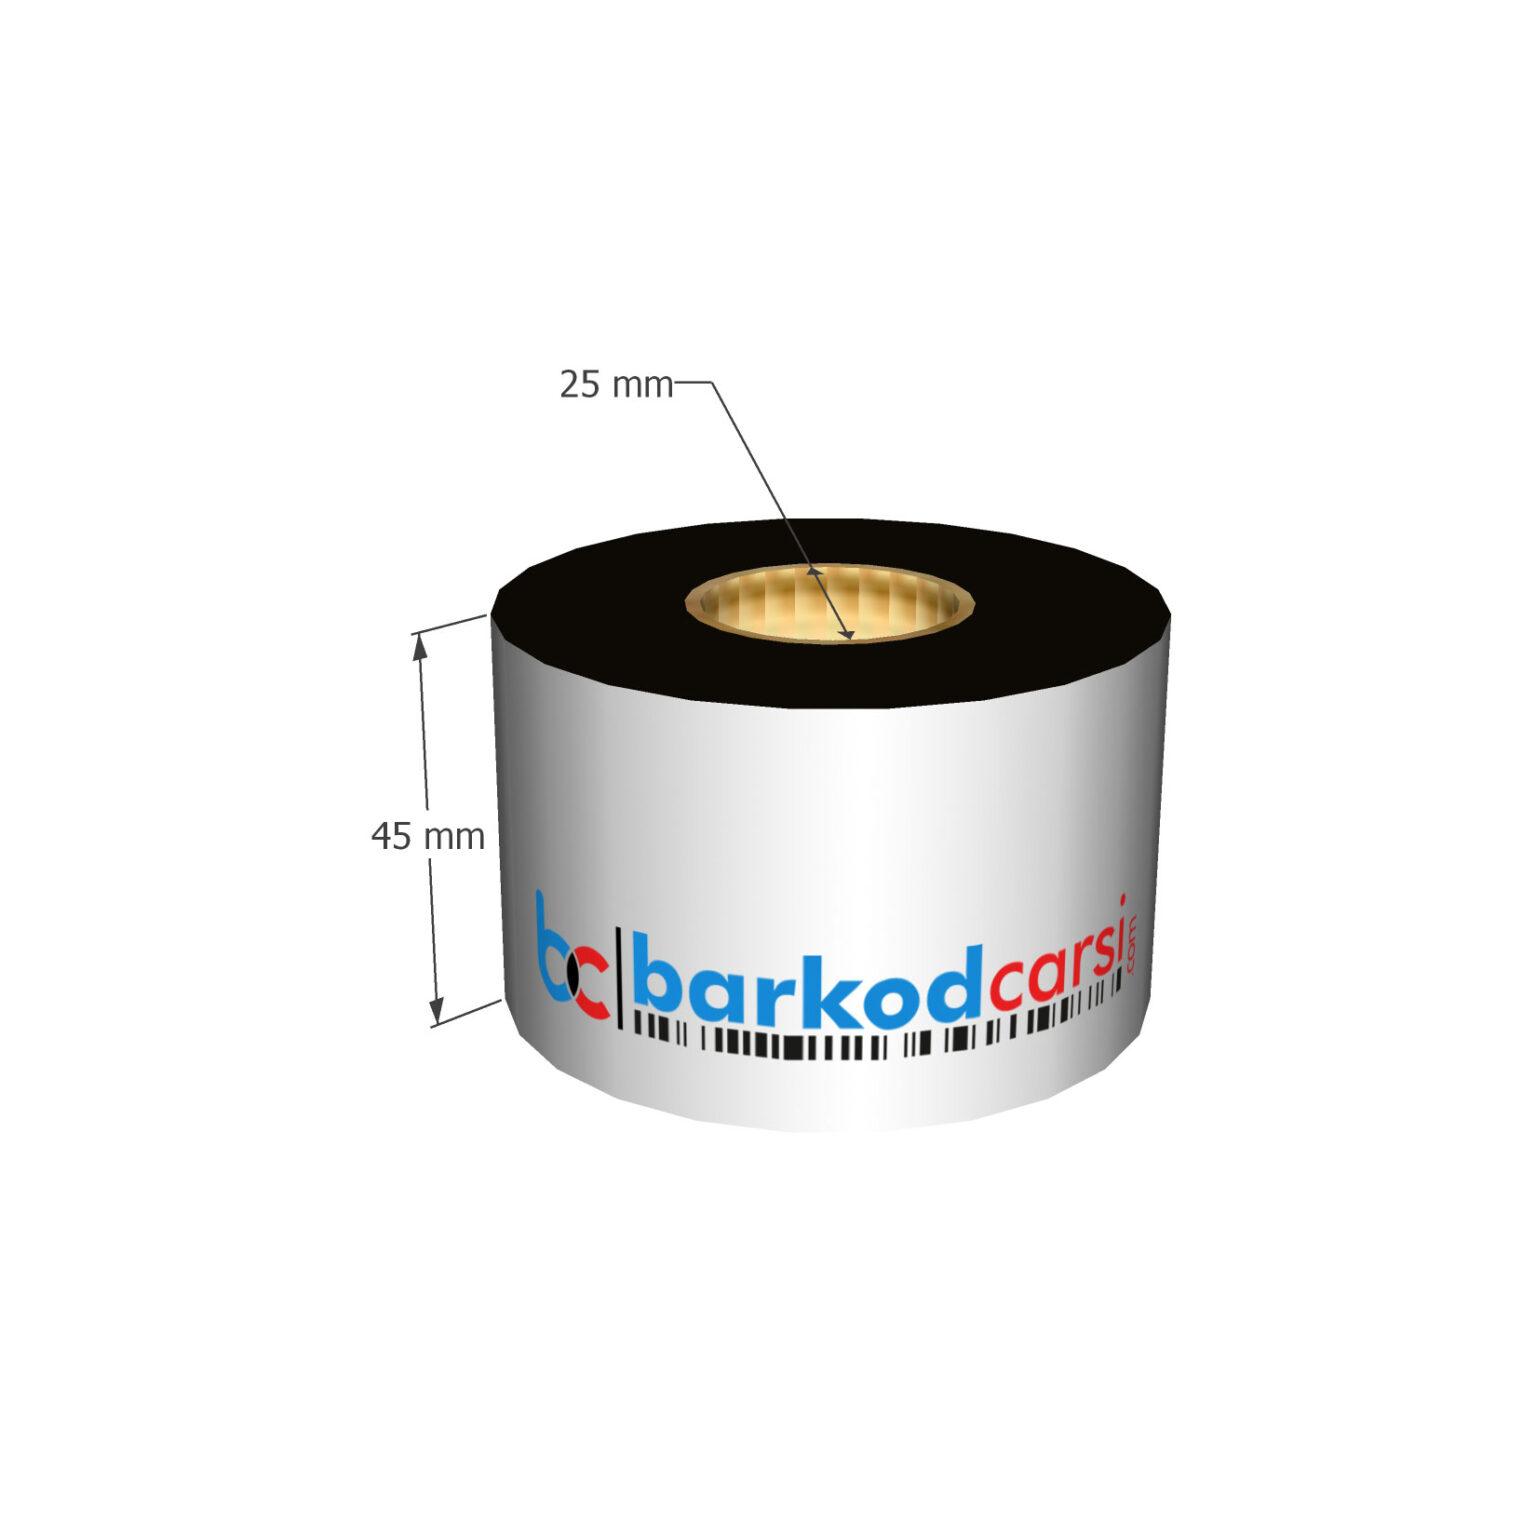 45x300 mt Wax / Wax-Resin / Resin / Hot-Foil Ribon Çeşitleri By BarkodCarsi.com